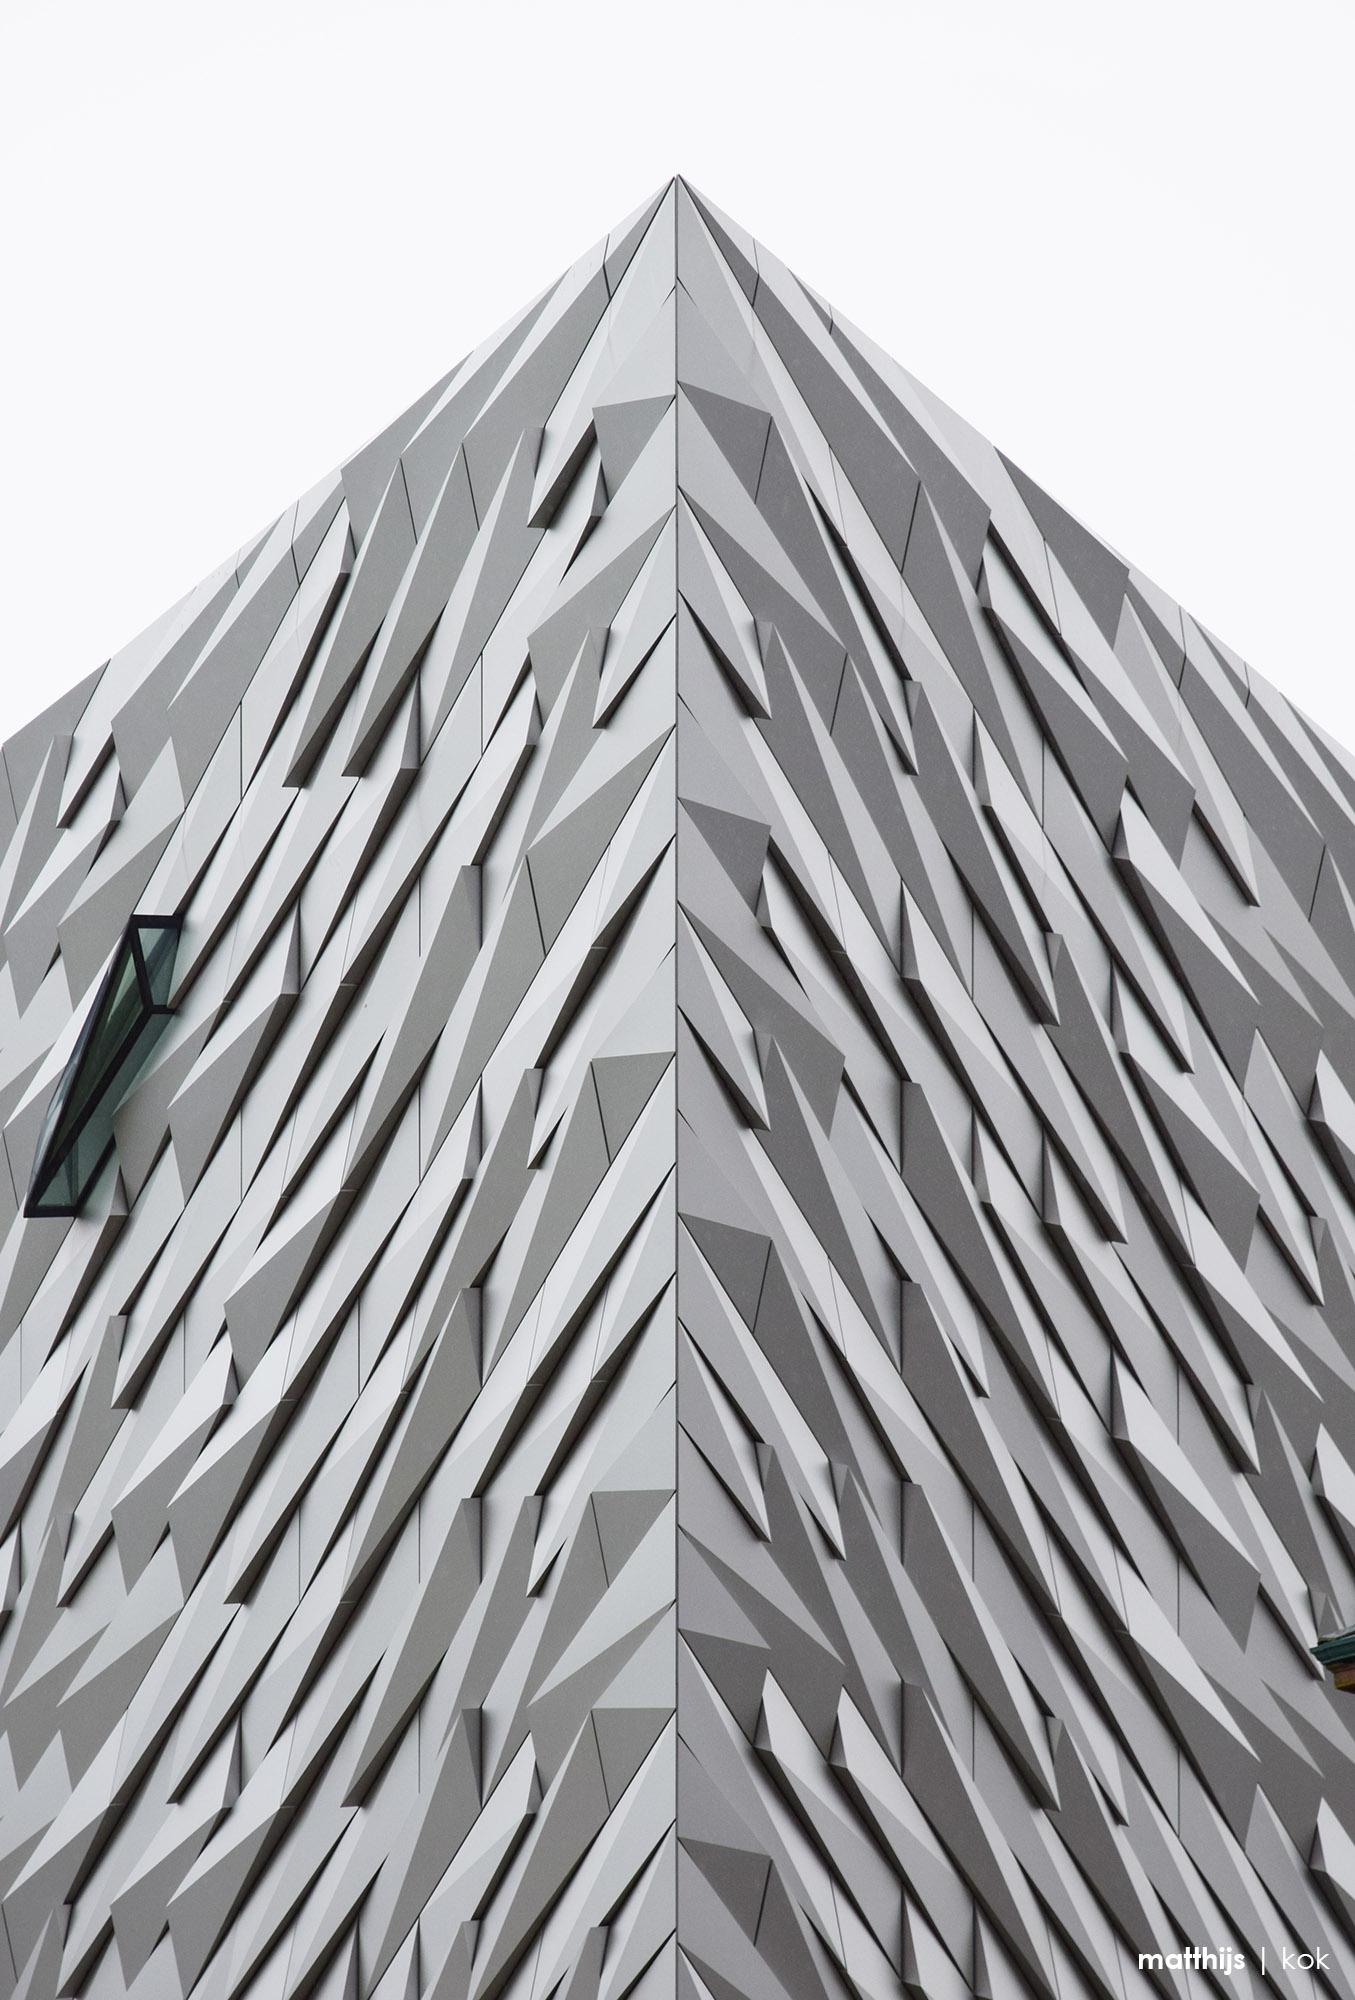 Titanic Museum, Belfast, Northern Ireland | Photo by Matthijs Kok